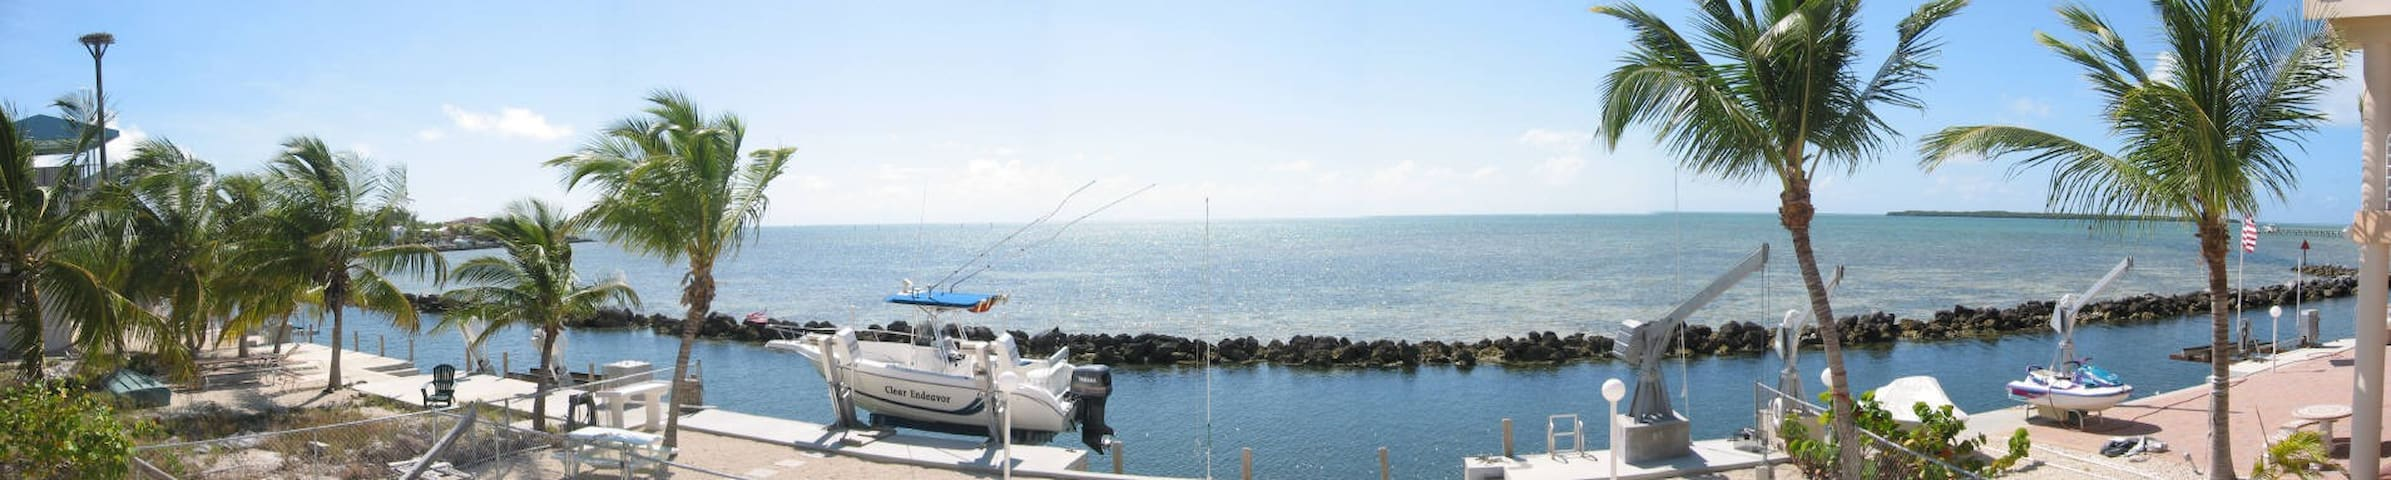 Island Gazer: 180 Degree Ocean and Island Views!